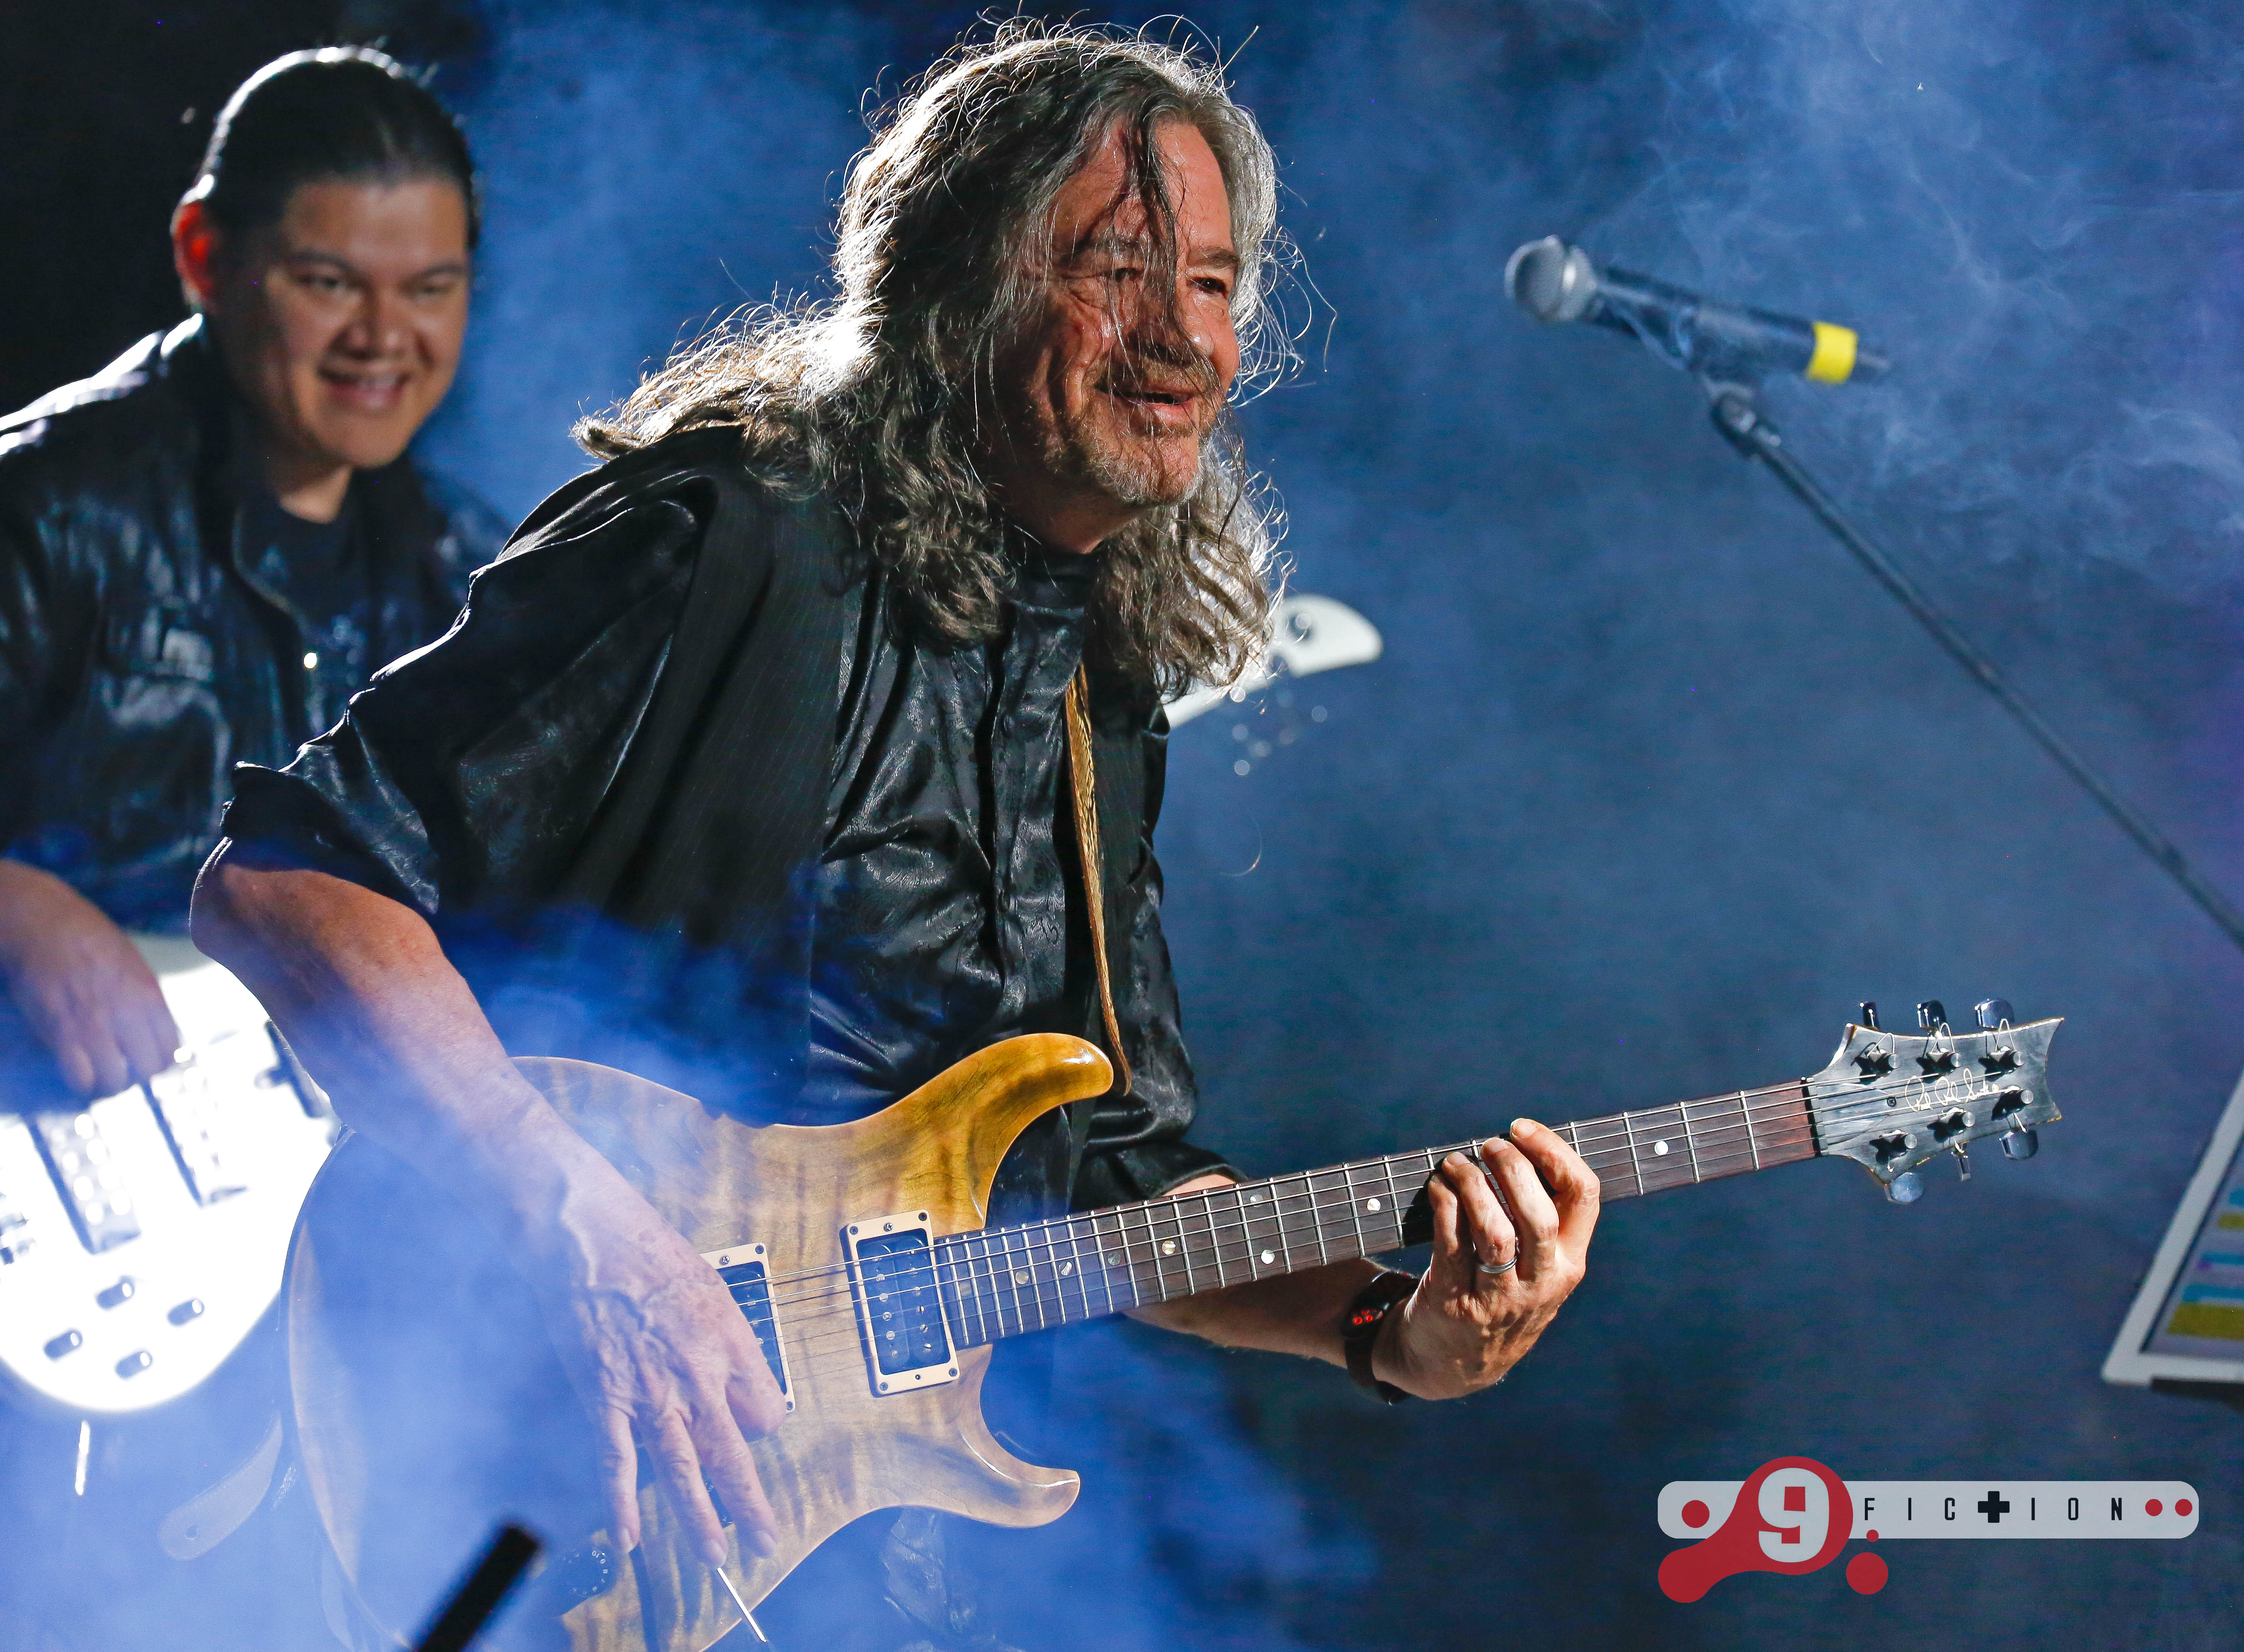 Homenaje a Pink Floyd_Luis Gómez Sandi_Nine Fiction (11)